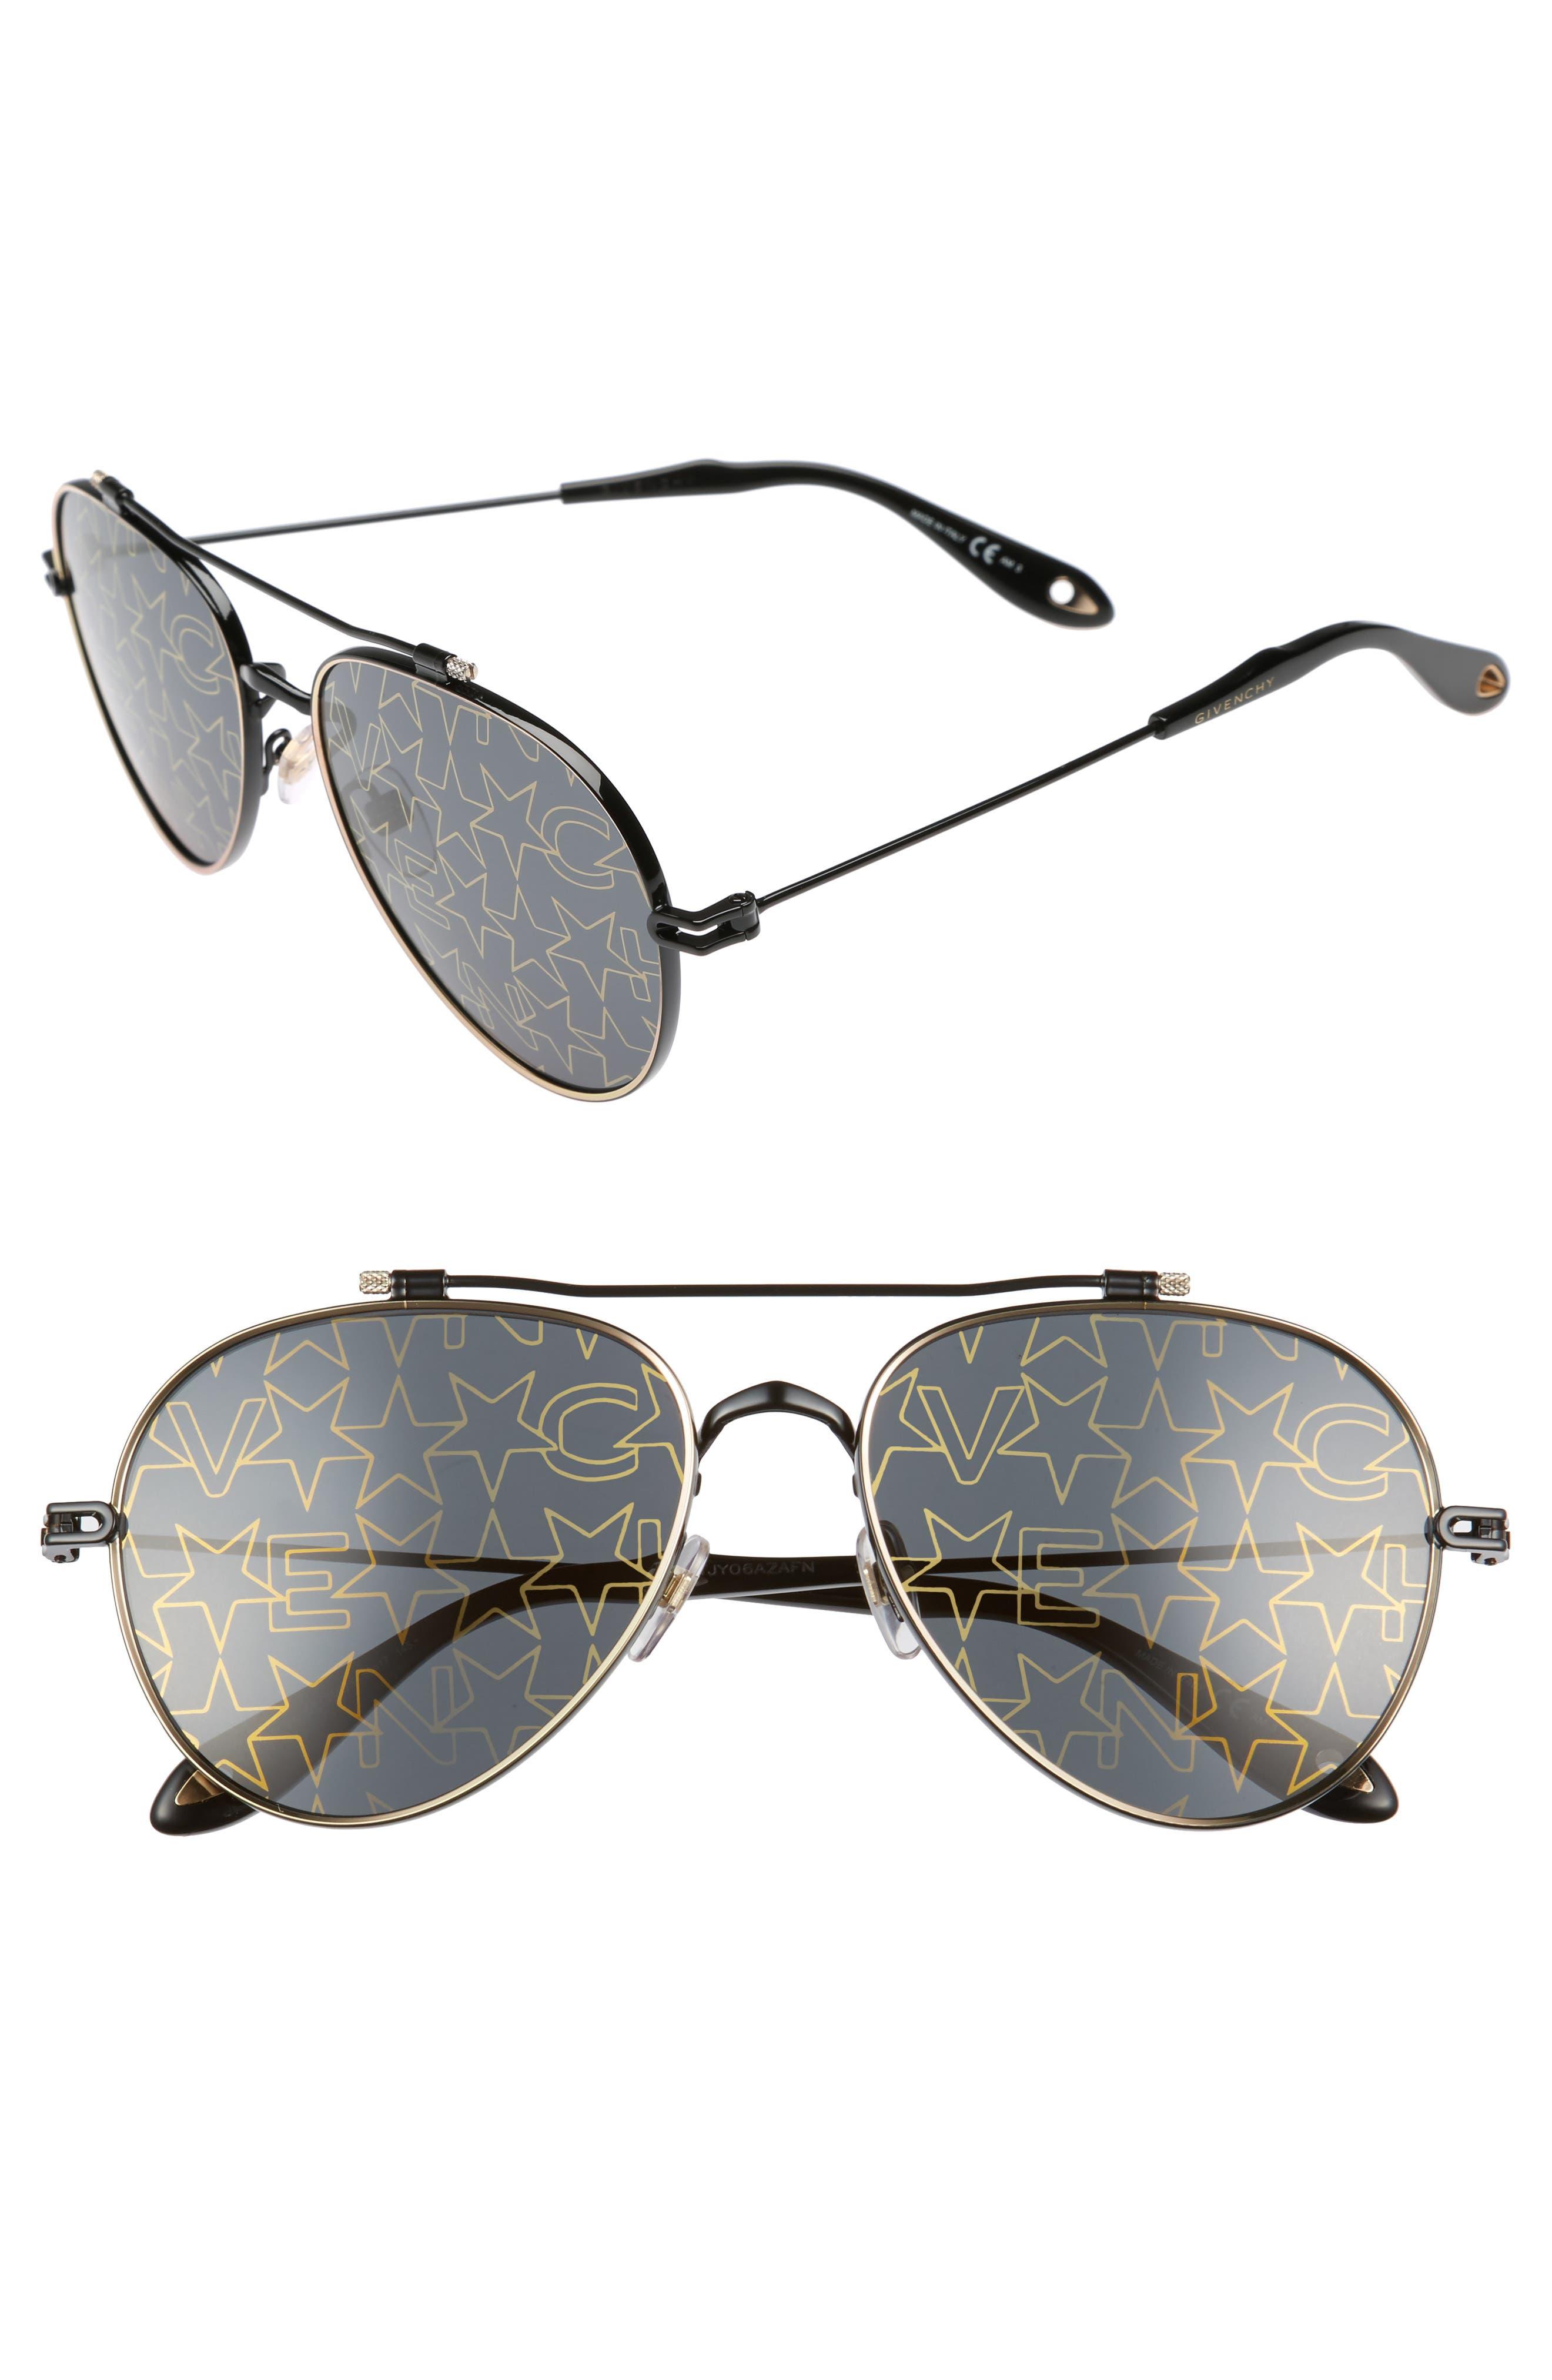 Main Image - Givenchy 58mm Aviator Sunglasses